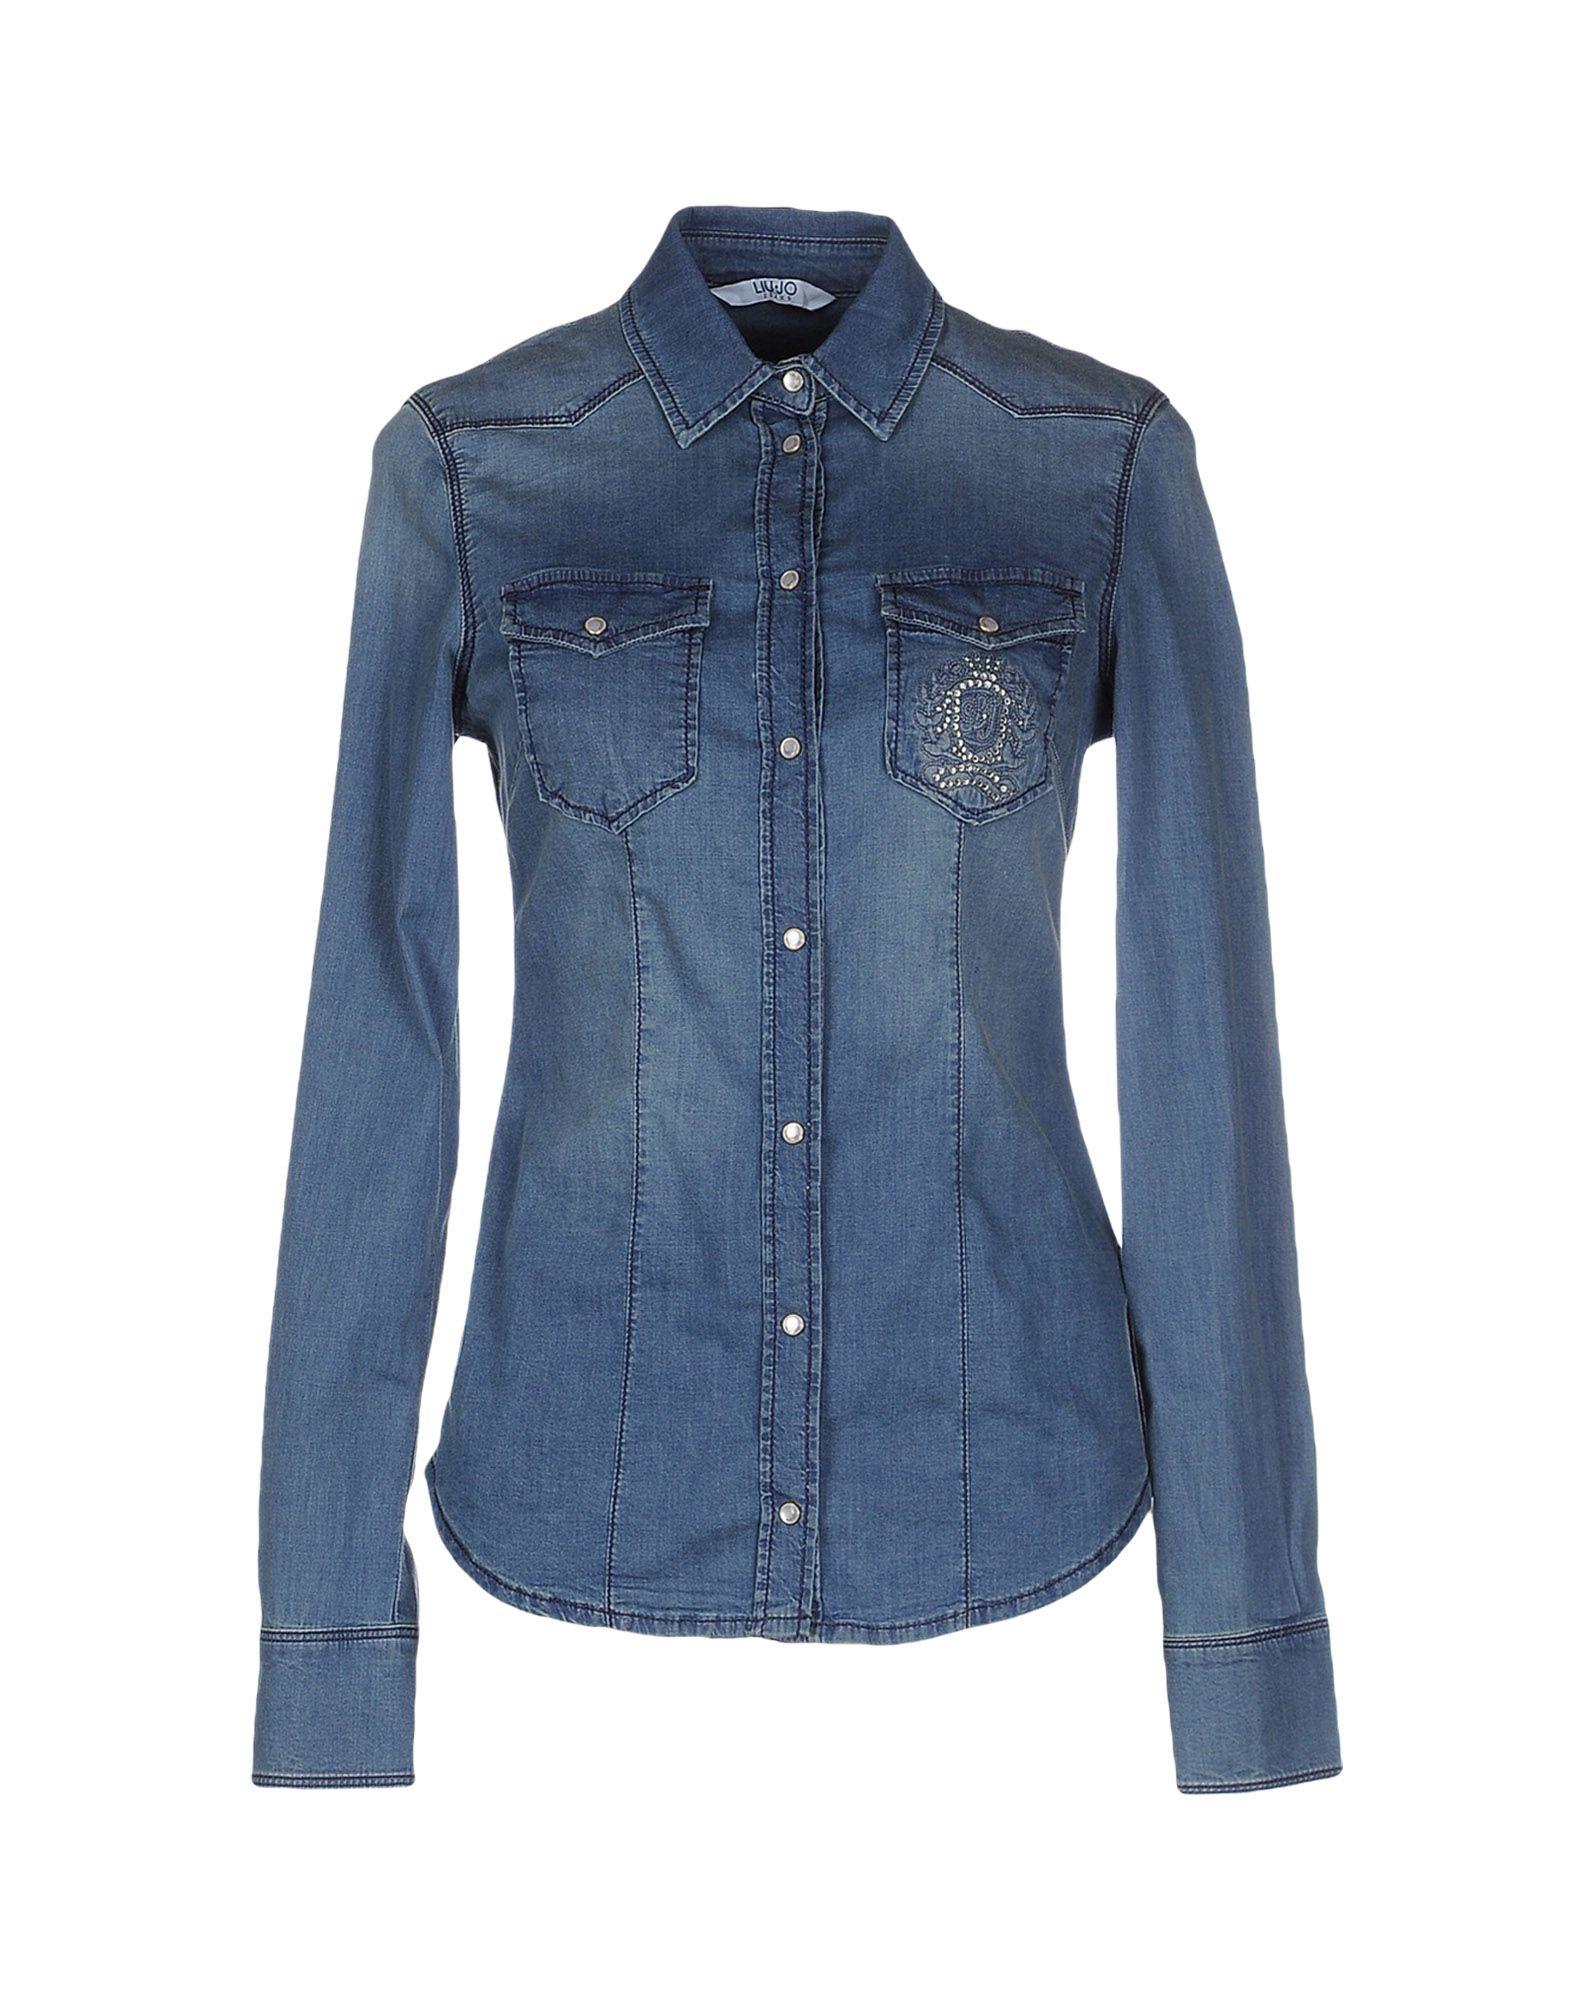 DENIM - Denim outerwear Liu Jo Footlocker Pictures Cheap Price tNUn2W